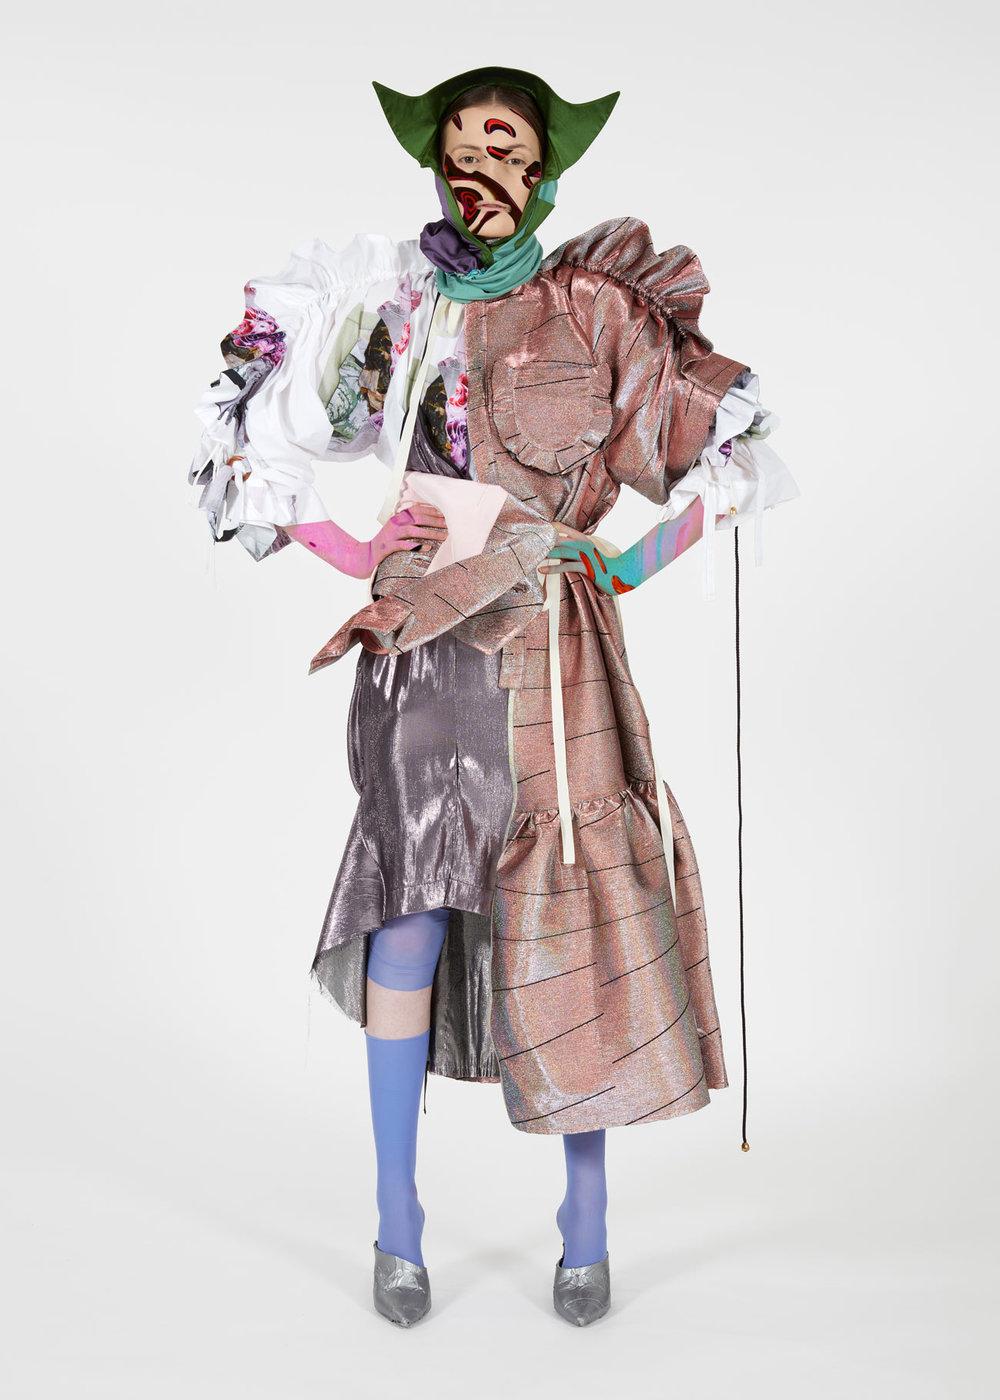 Schueller-de-Waal-he-Gateway-To-Fashion-LE-MILE-Magazine-4.jpg